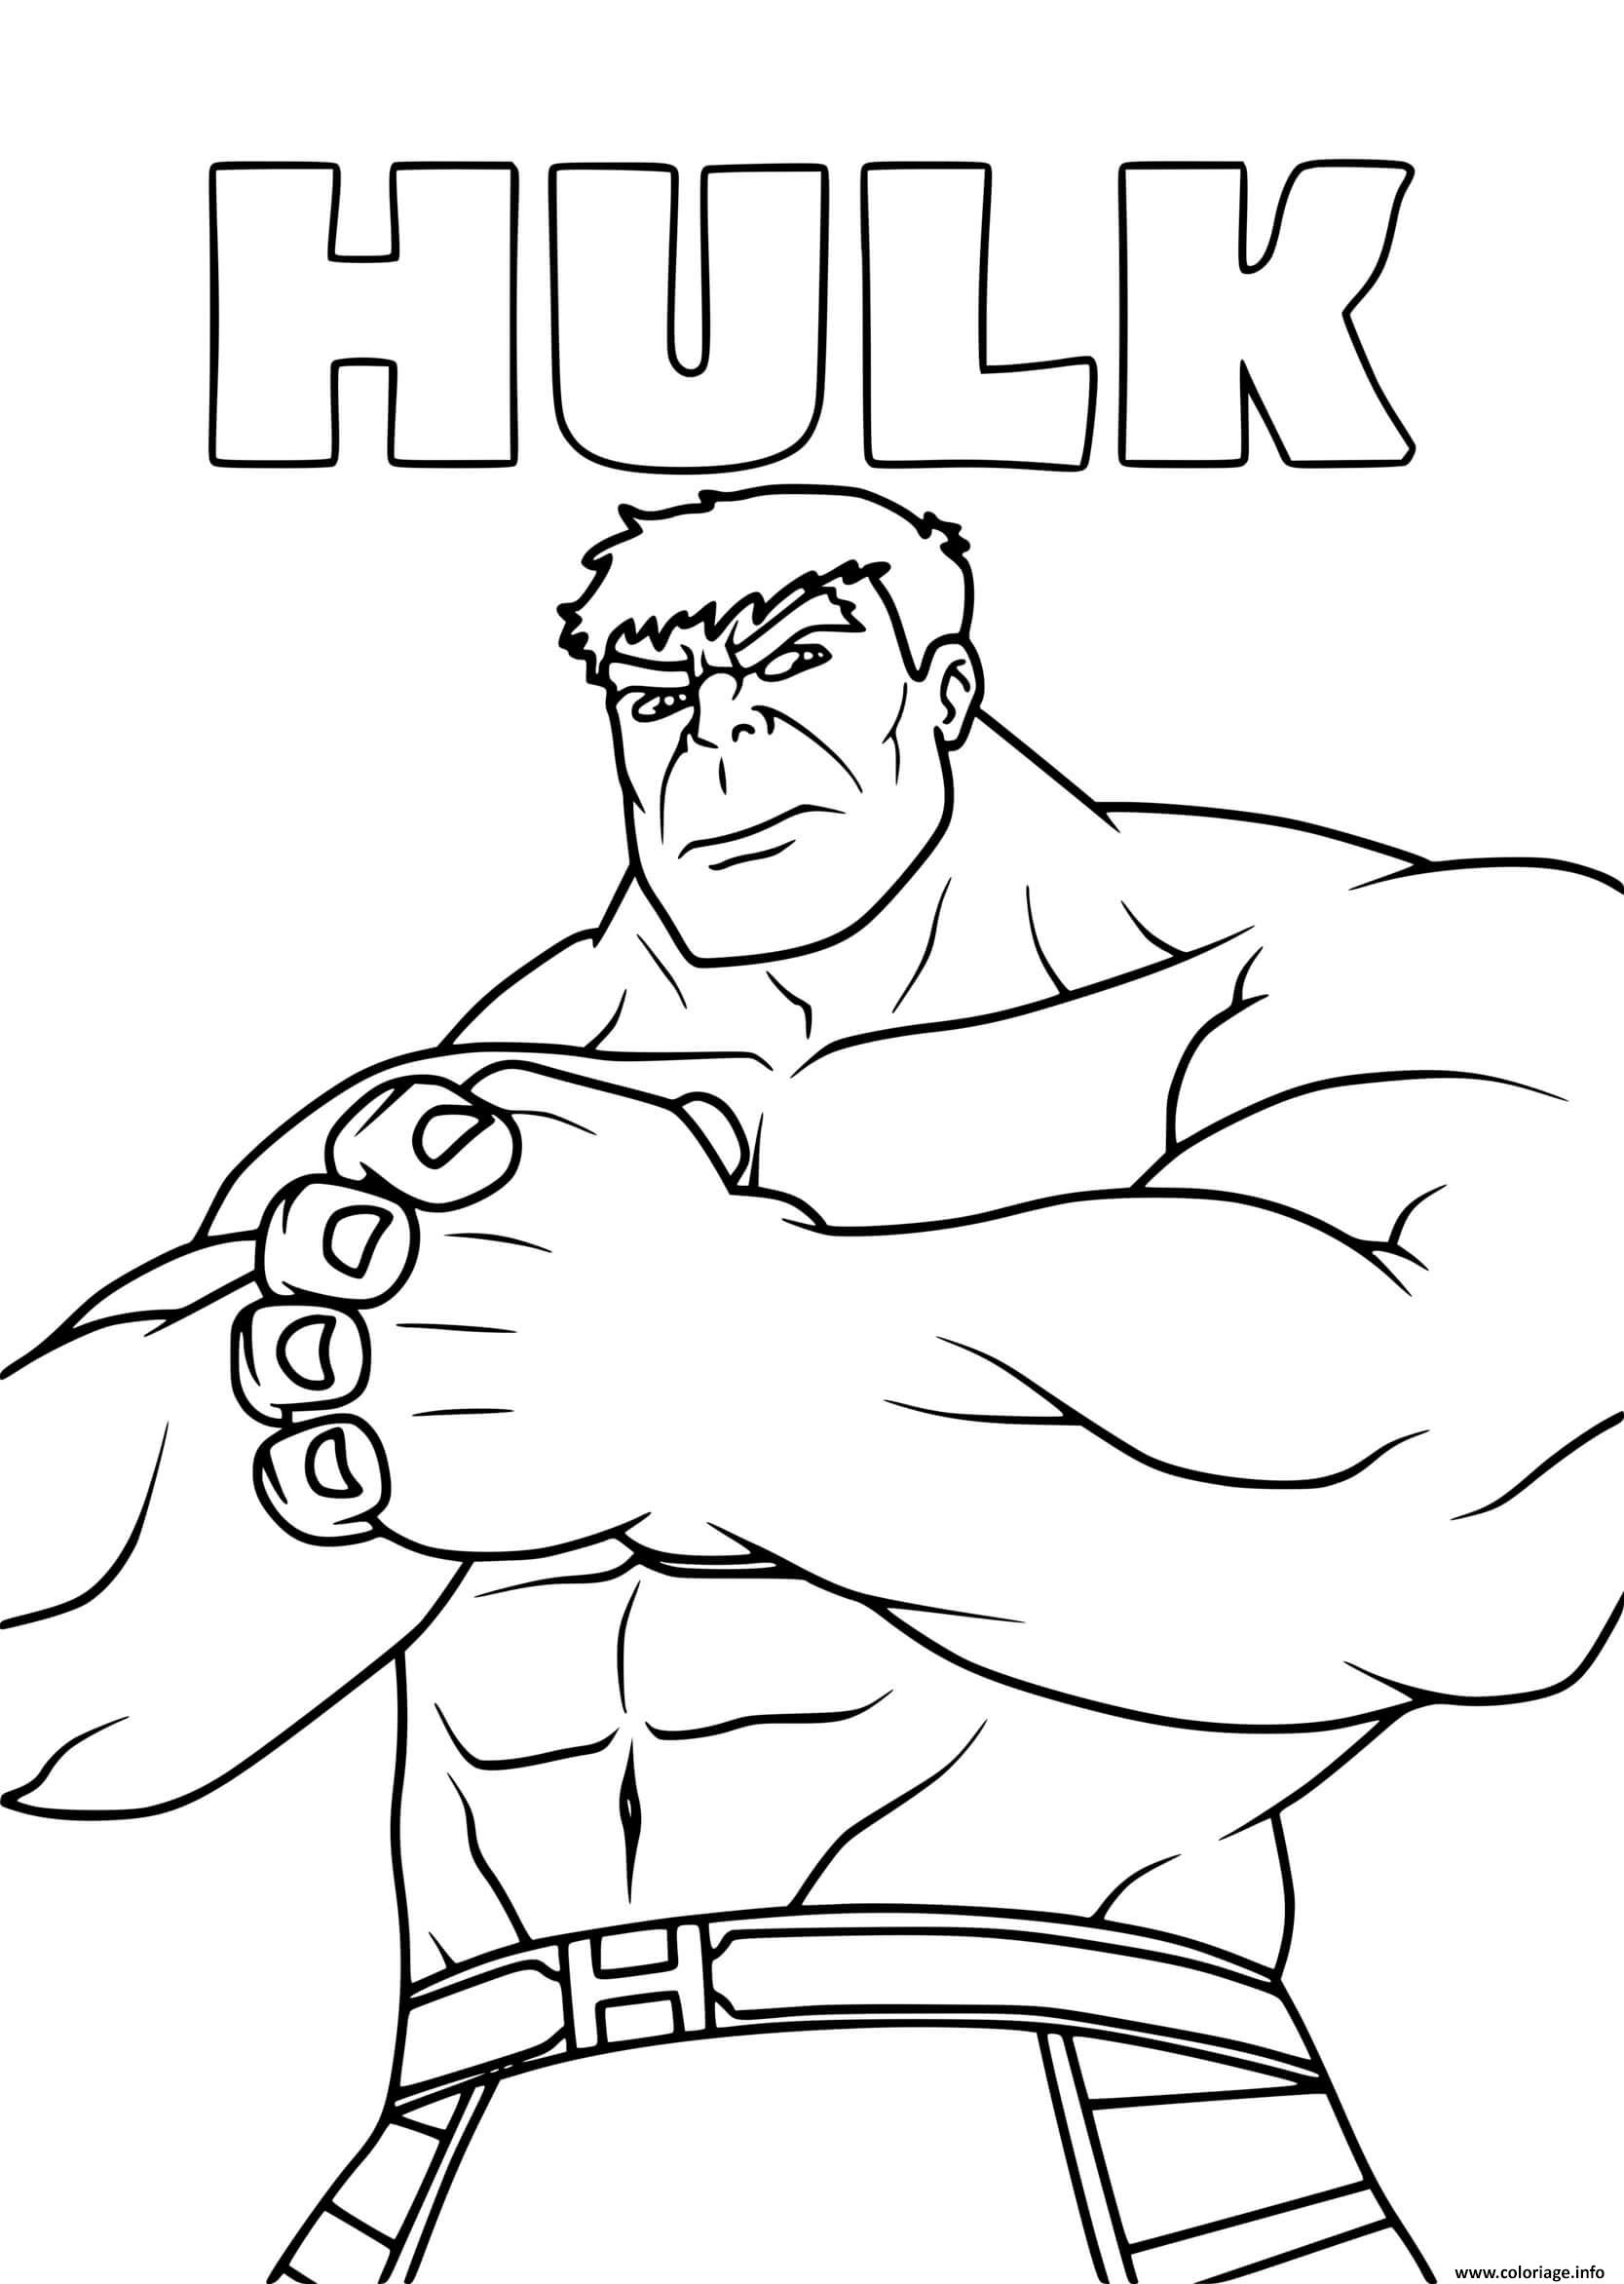 Dessin hulk titan vert super heros Coloriage Gratuit à Imprimer